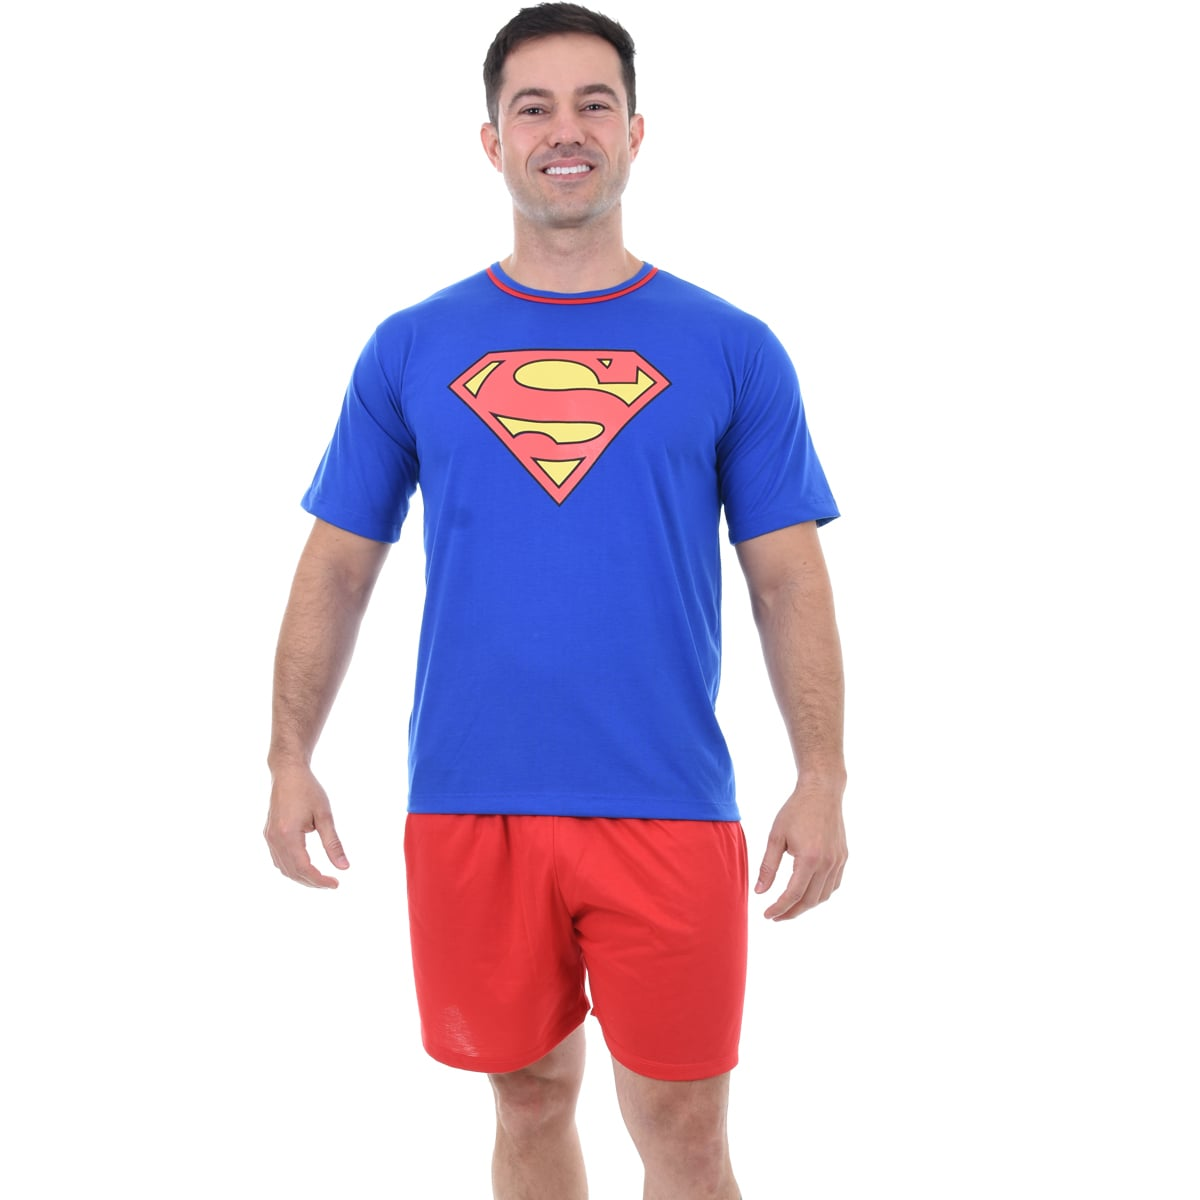 Pijama Meia Manga Short Masculino Adulto Superman Super Homem Ref 347